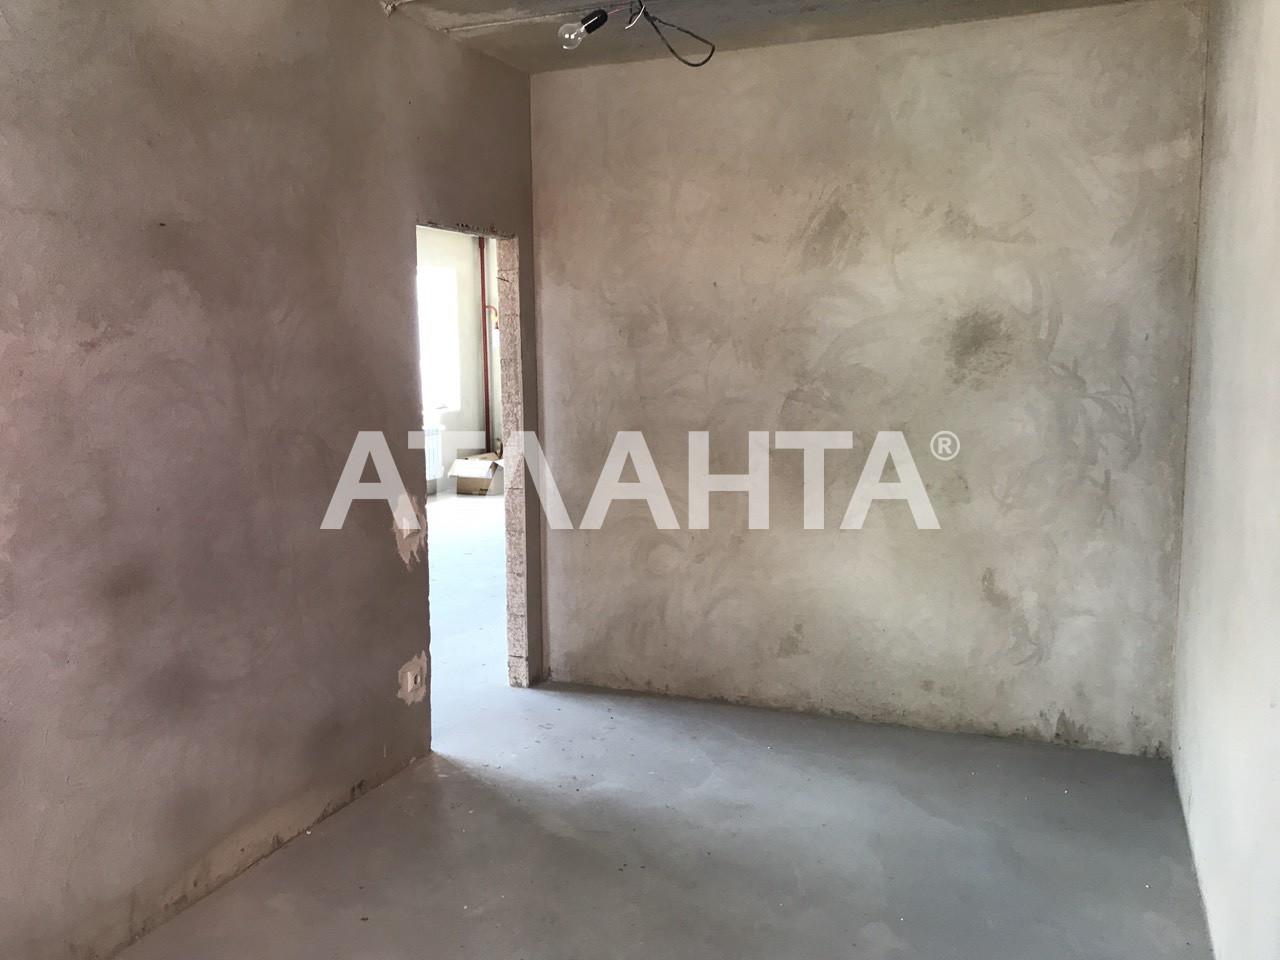 Продается 3-комнатная Квартира на ул. Валовня — 49 000 у.е. (фото №7)